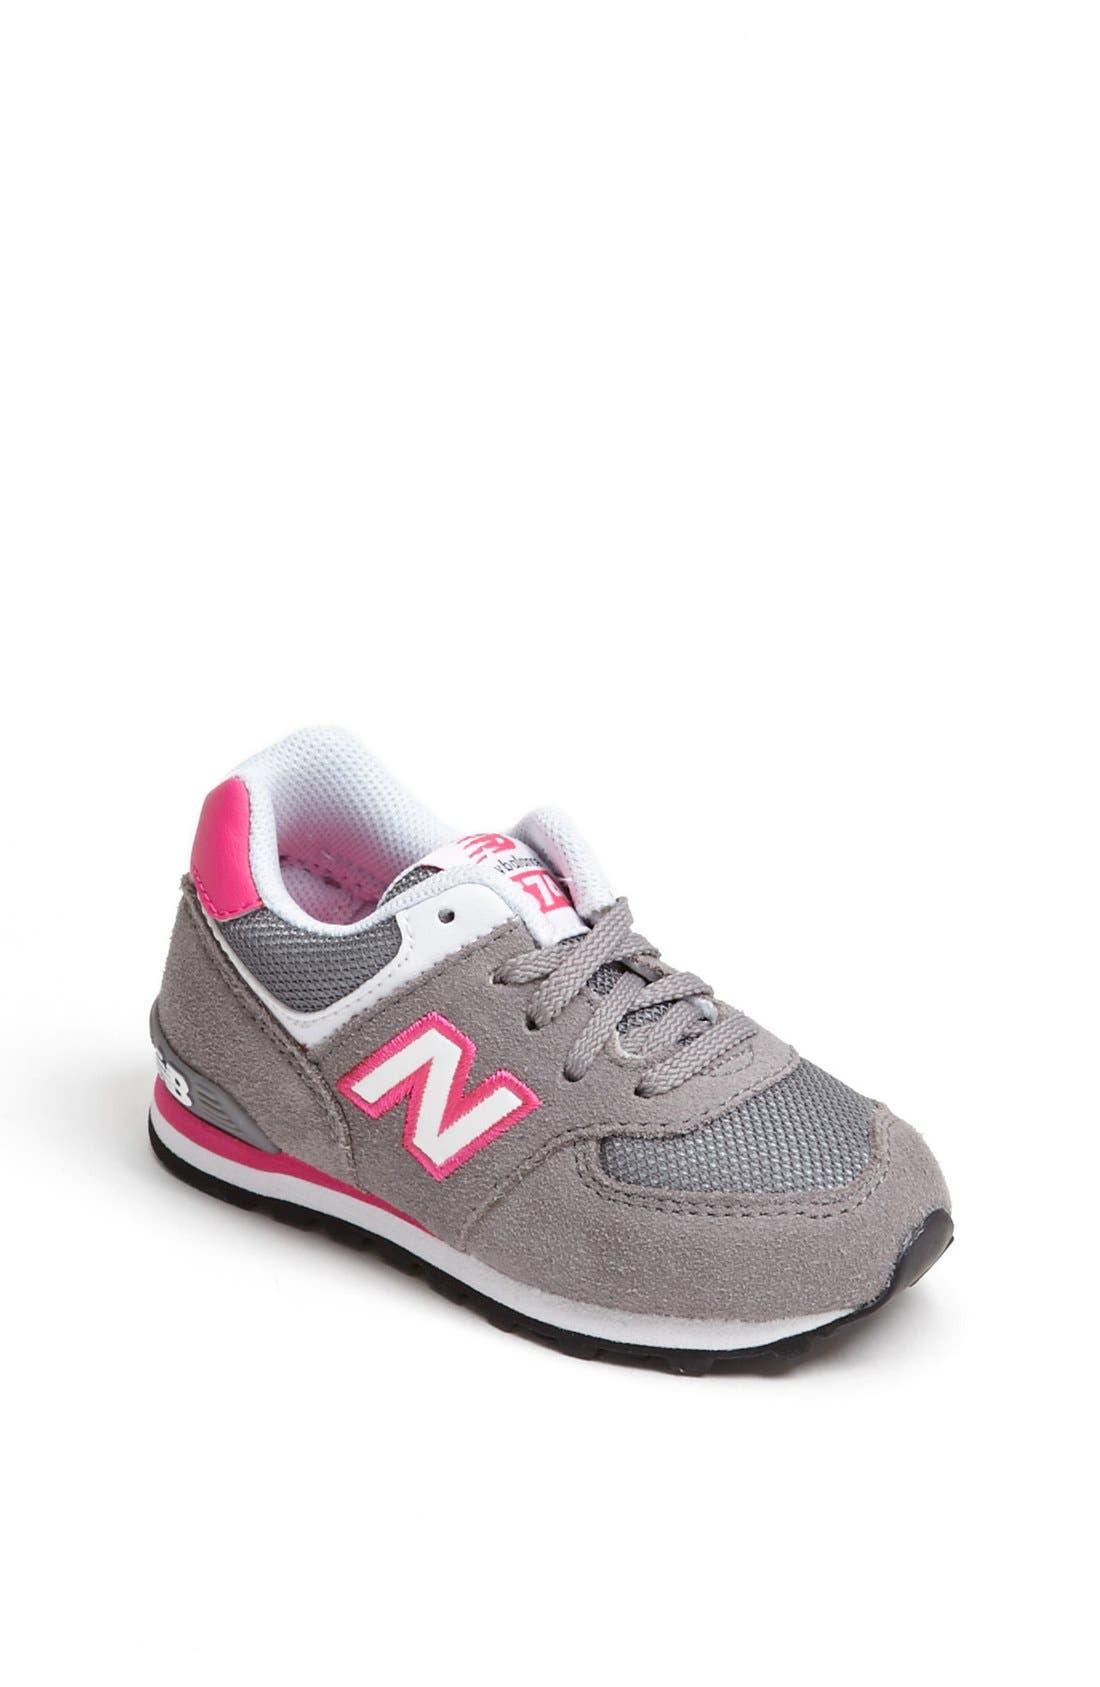 Main Image - New Balance '574' Running Shoe (Baby, Walker & Toddler)